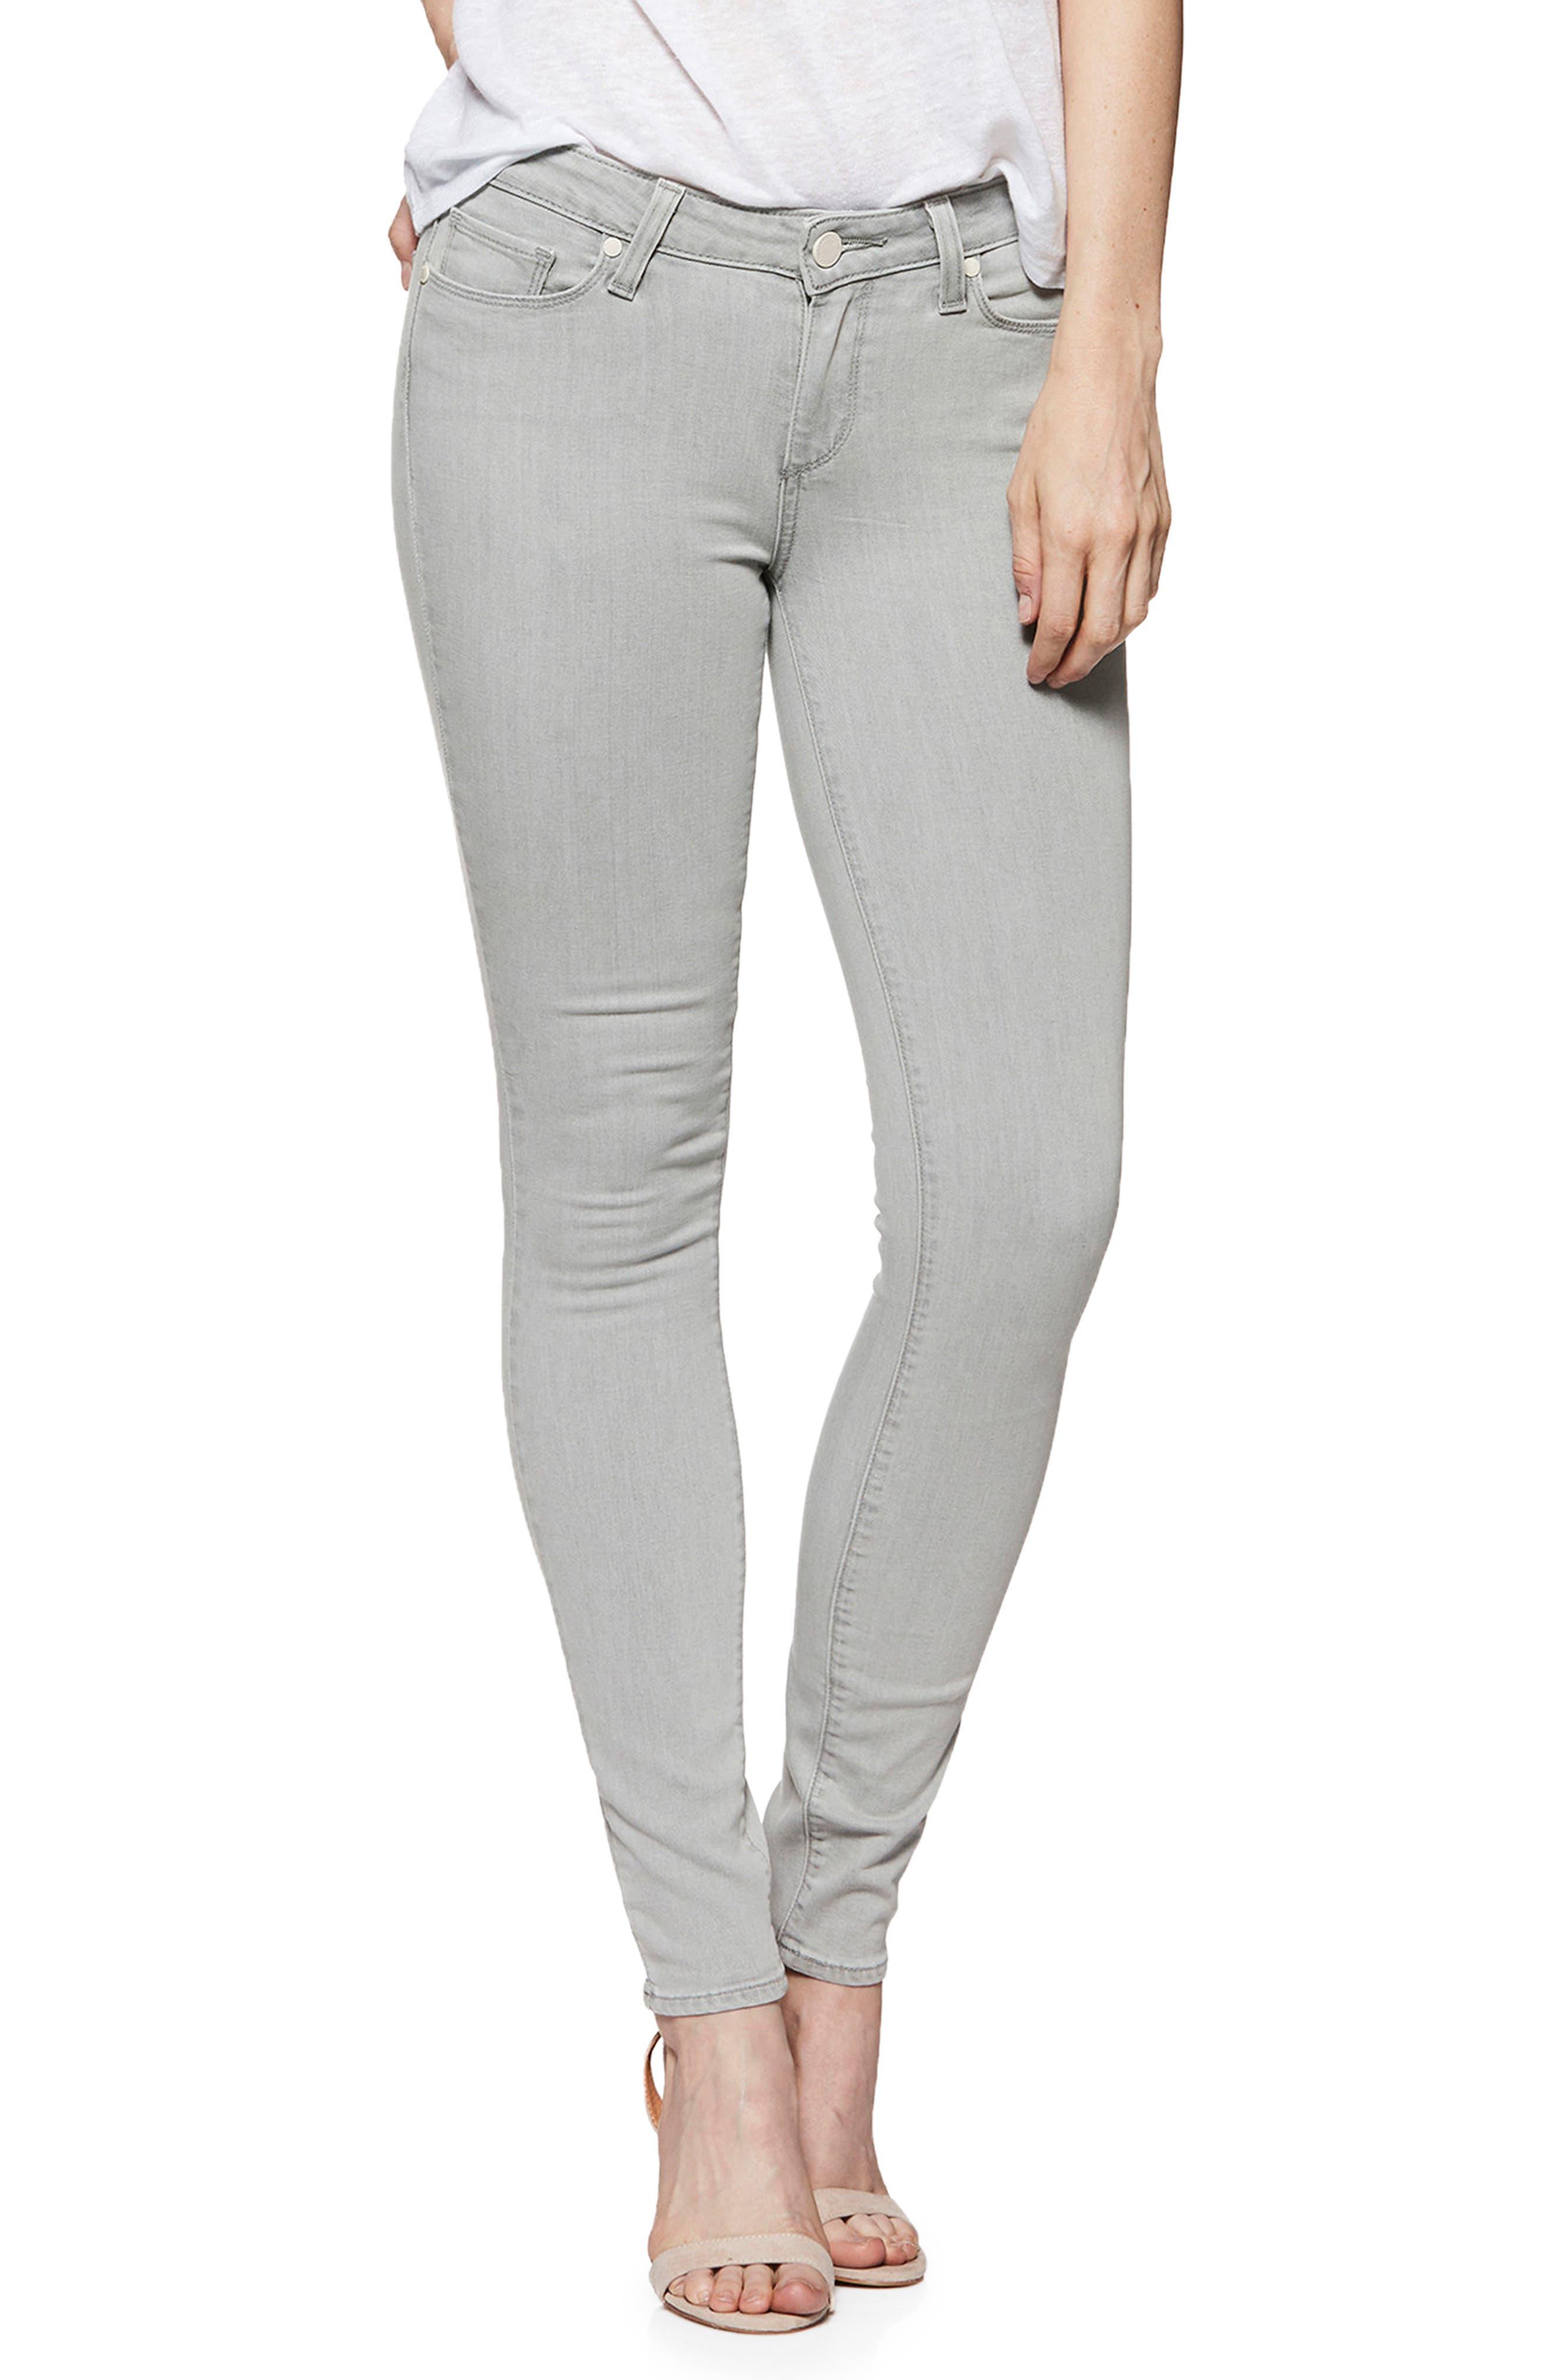 Transcend - Verdugo Ultra Skinny Jeans,                             Main thumbnail 1, color,